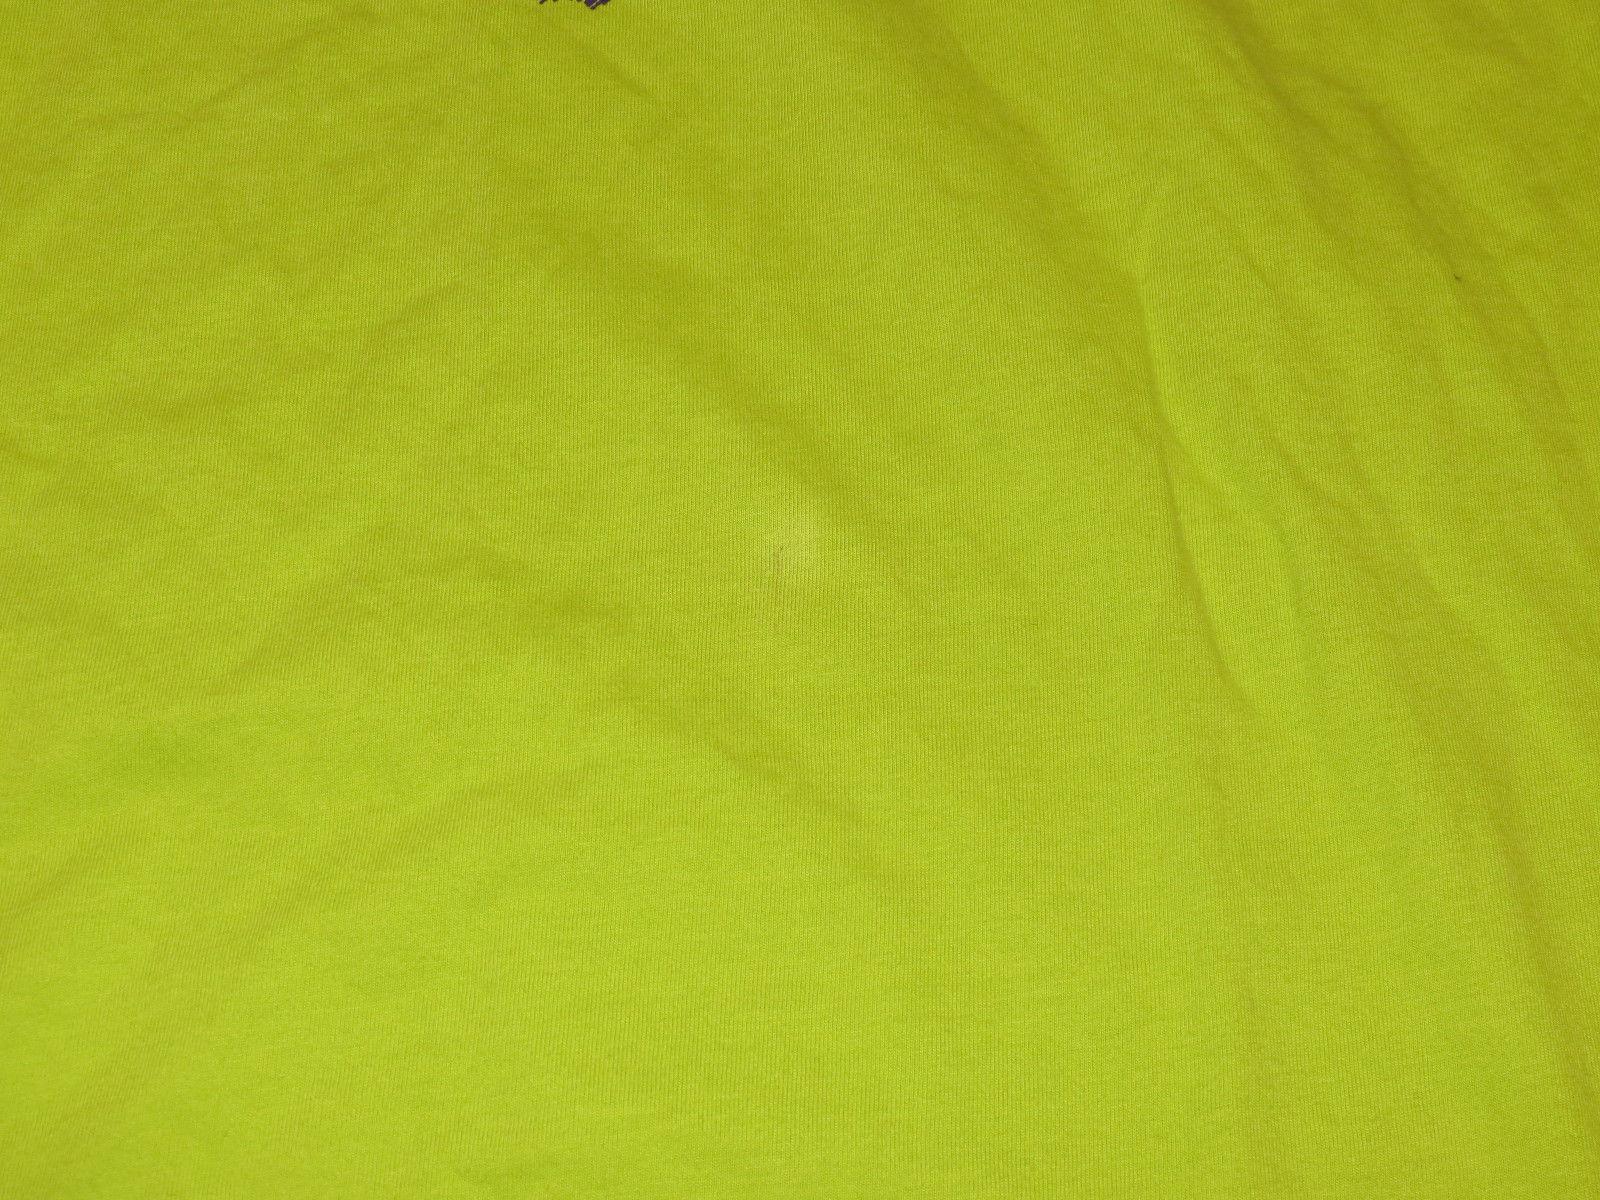 Boys Nike L 14/16 T shirt 6.0 skate youth bright cactus purple soft 975448 *SPOT